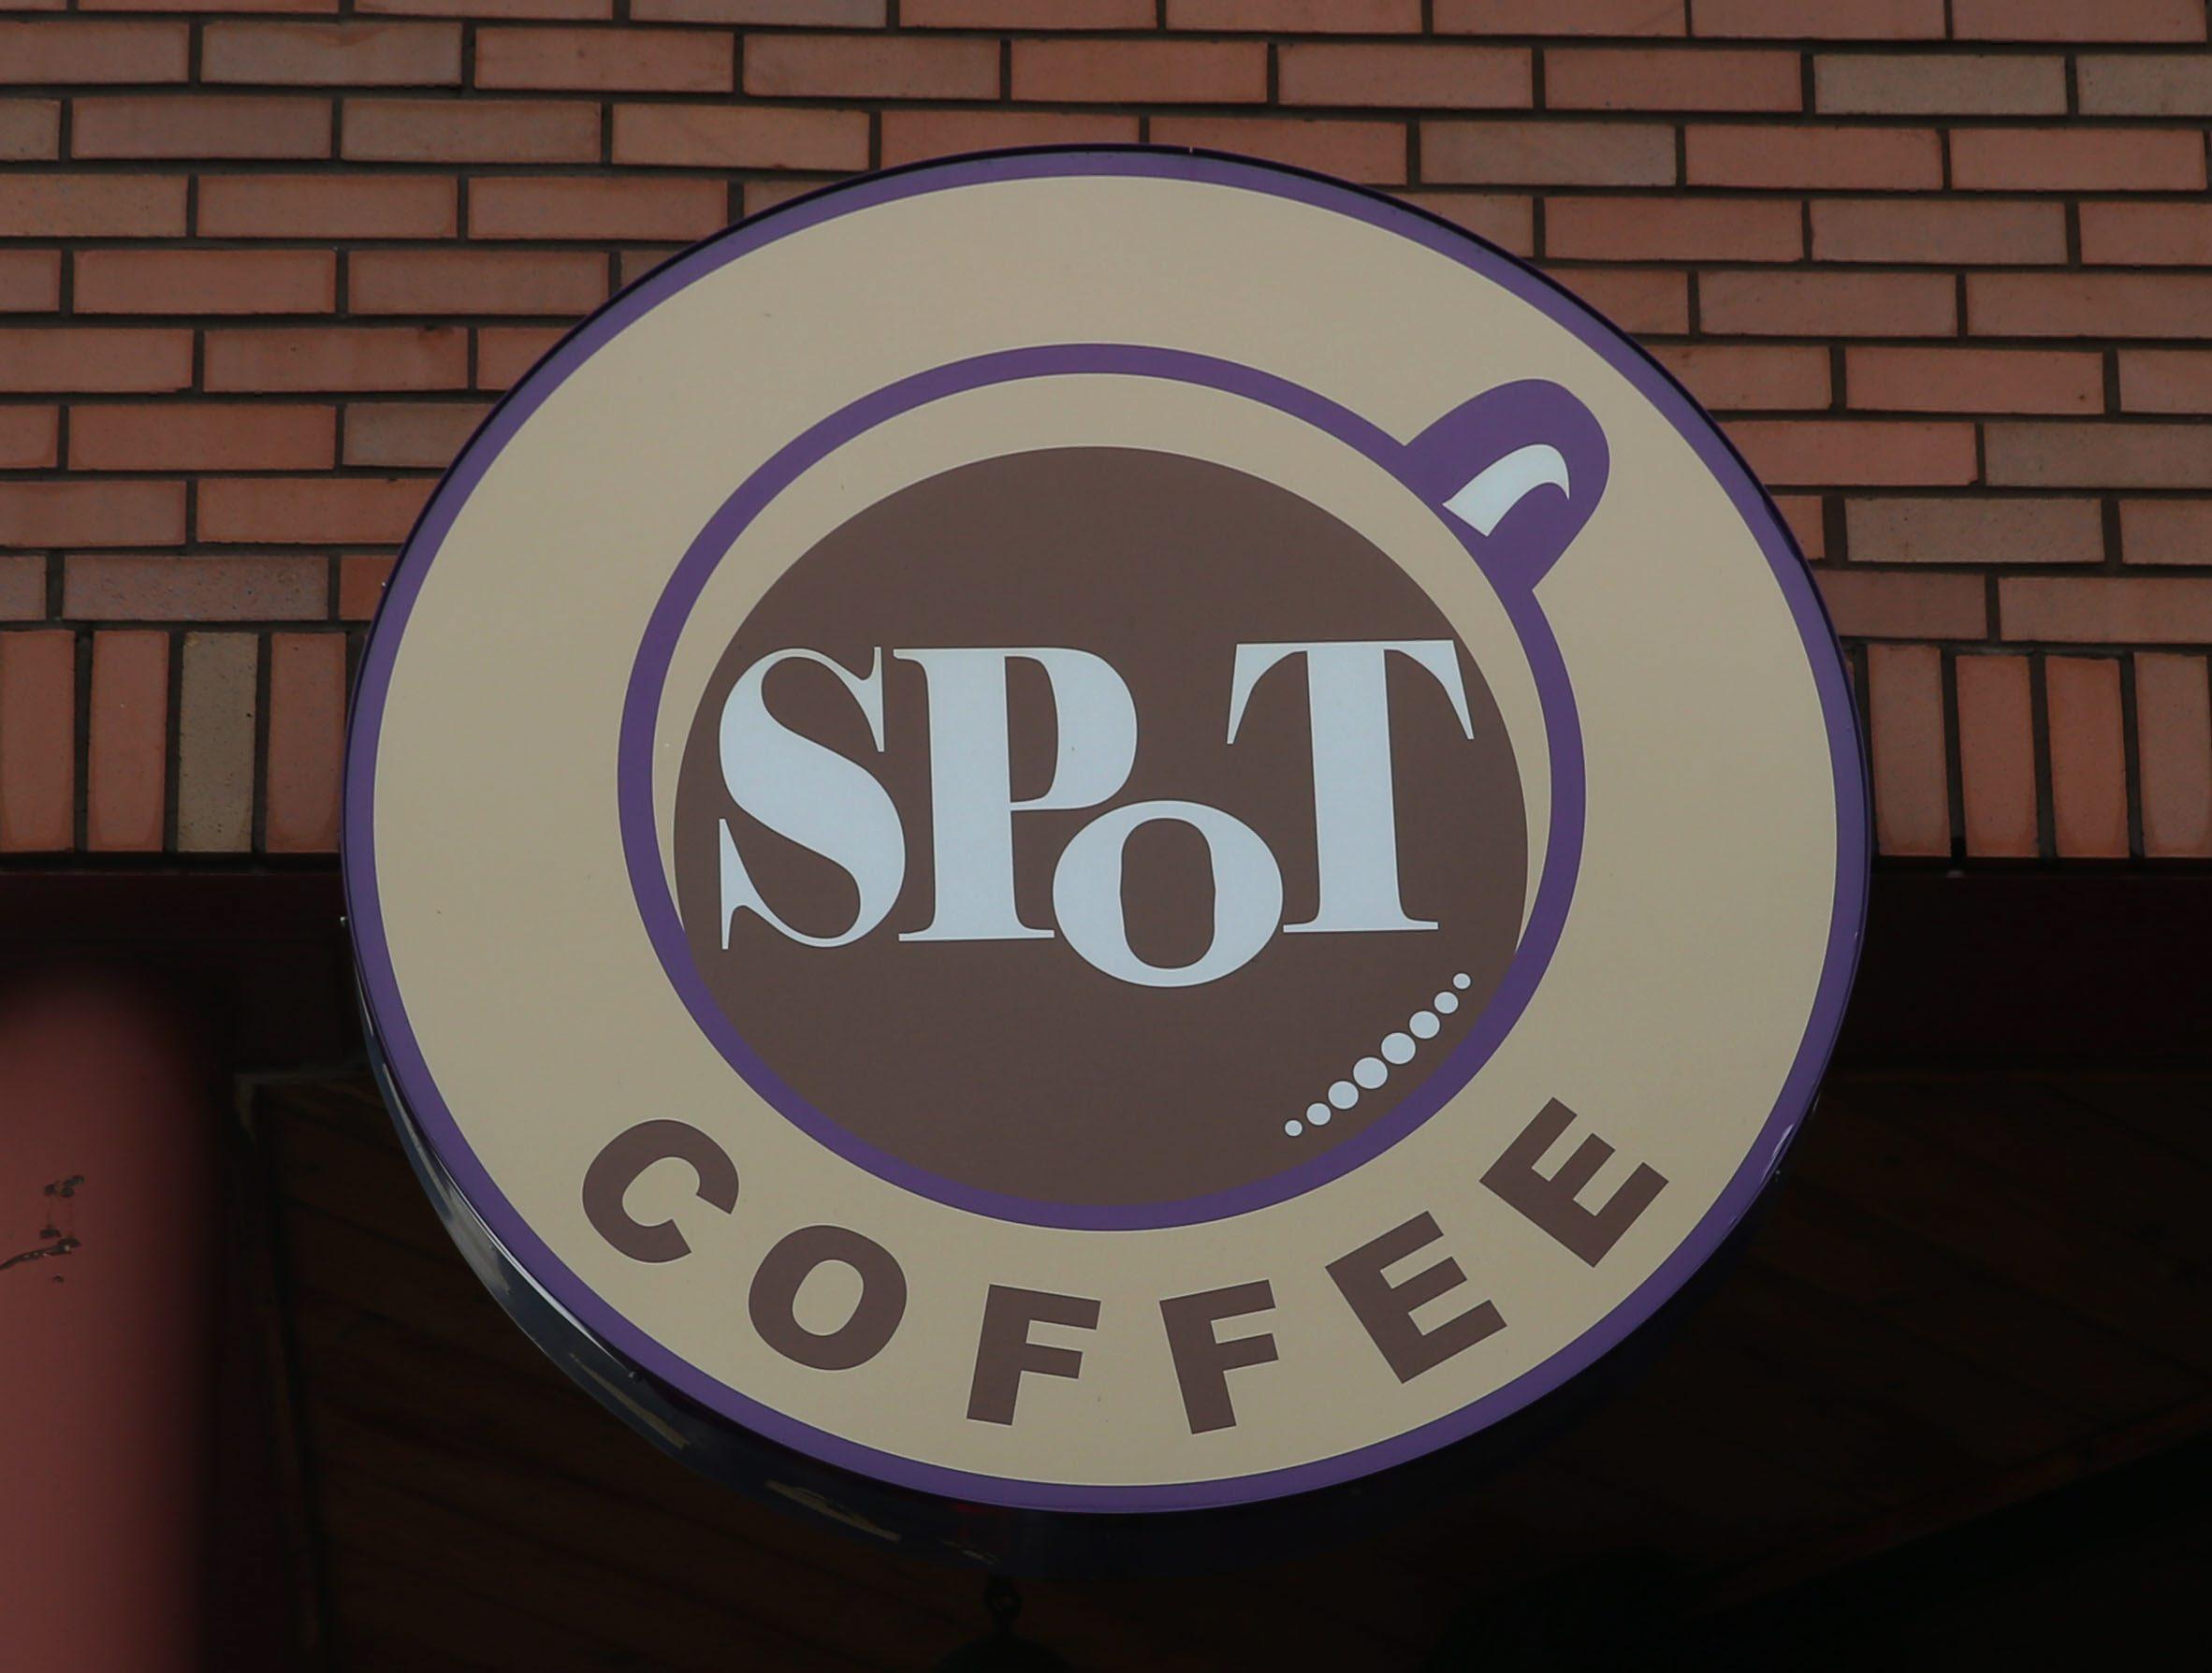 Spot Coffee will add a drive-thru to its Transit location. (Sharon Cantillon/Buffalo News file photo)